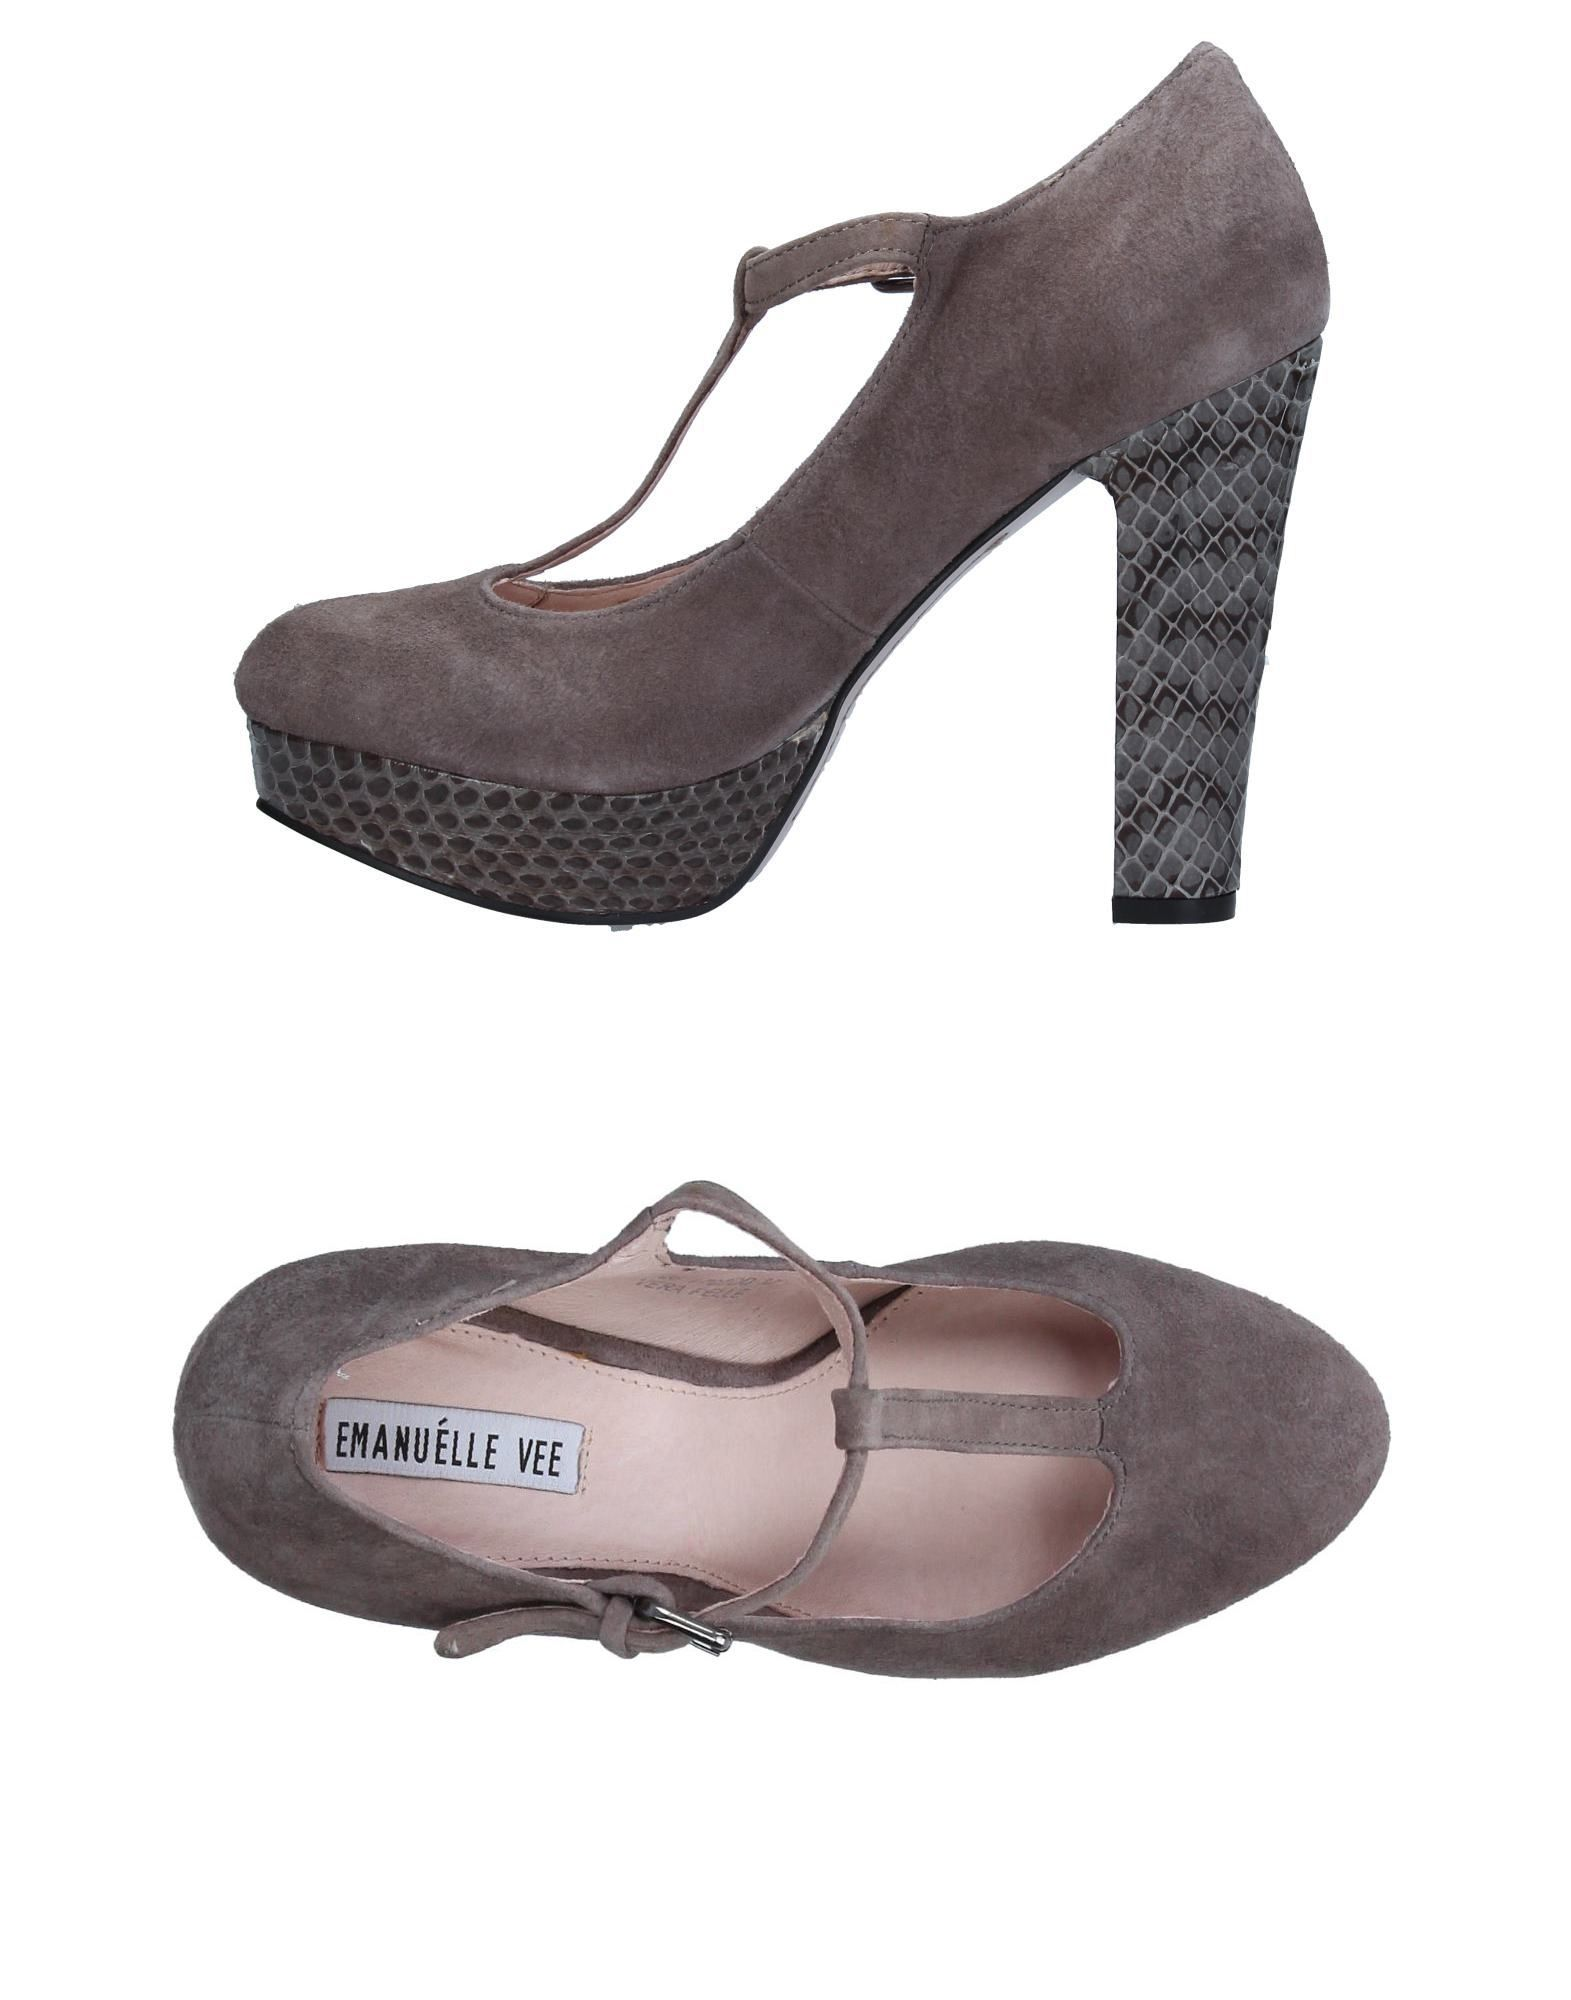 Emanuélle Vee Pumps Damen  11368110OS Gute Qualität beliebte Schuhe